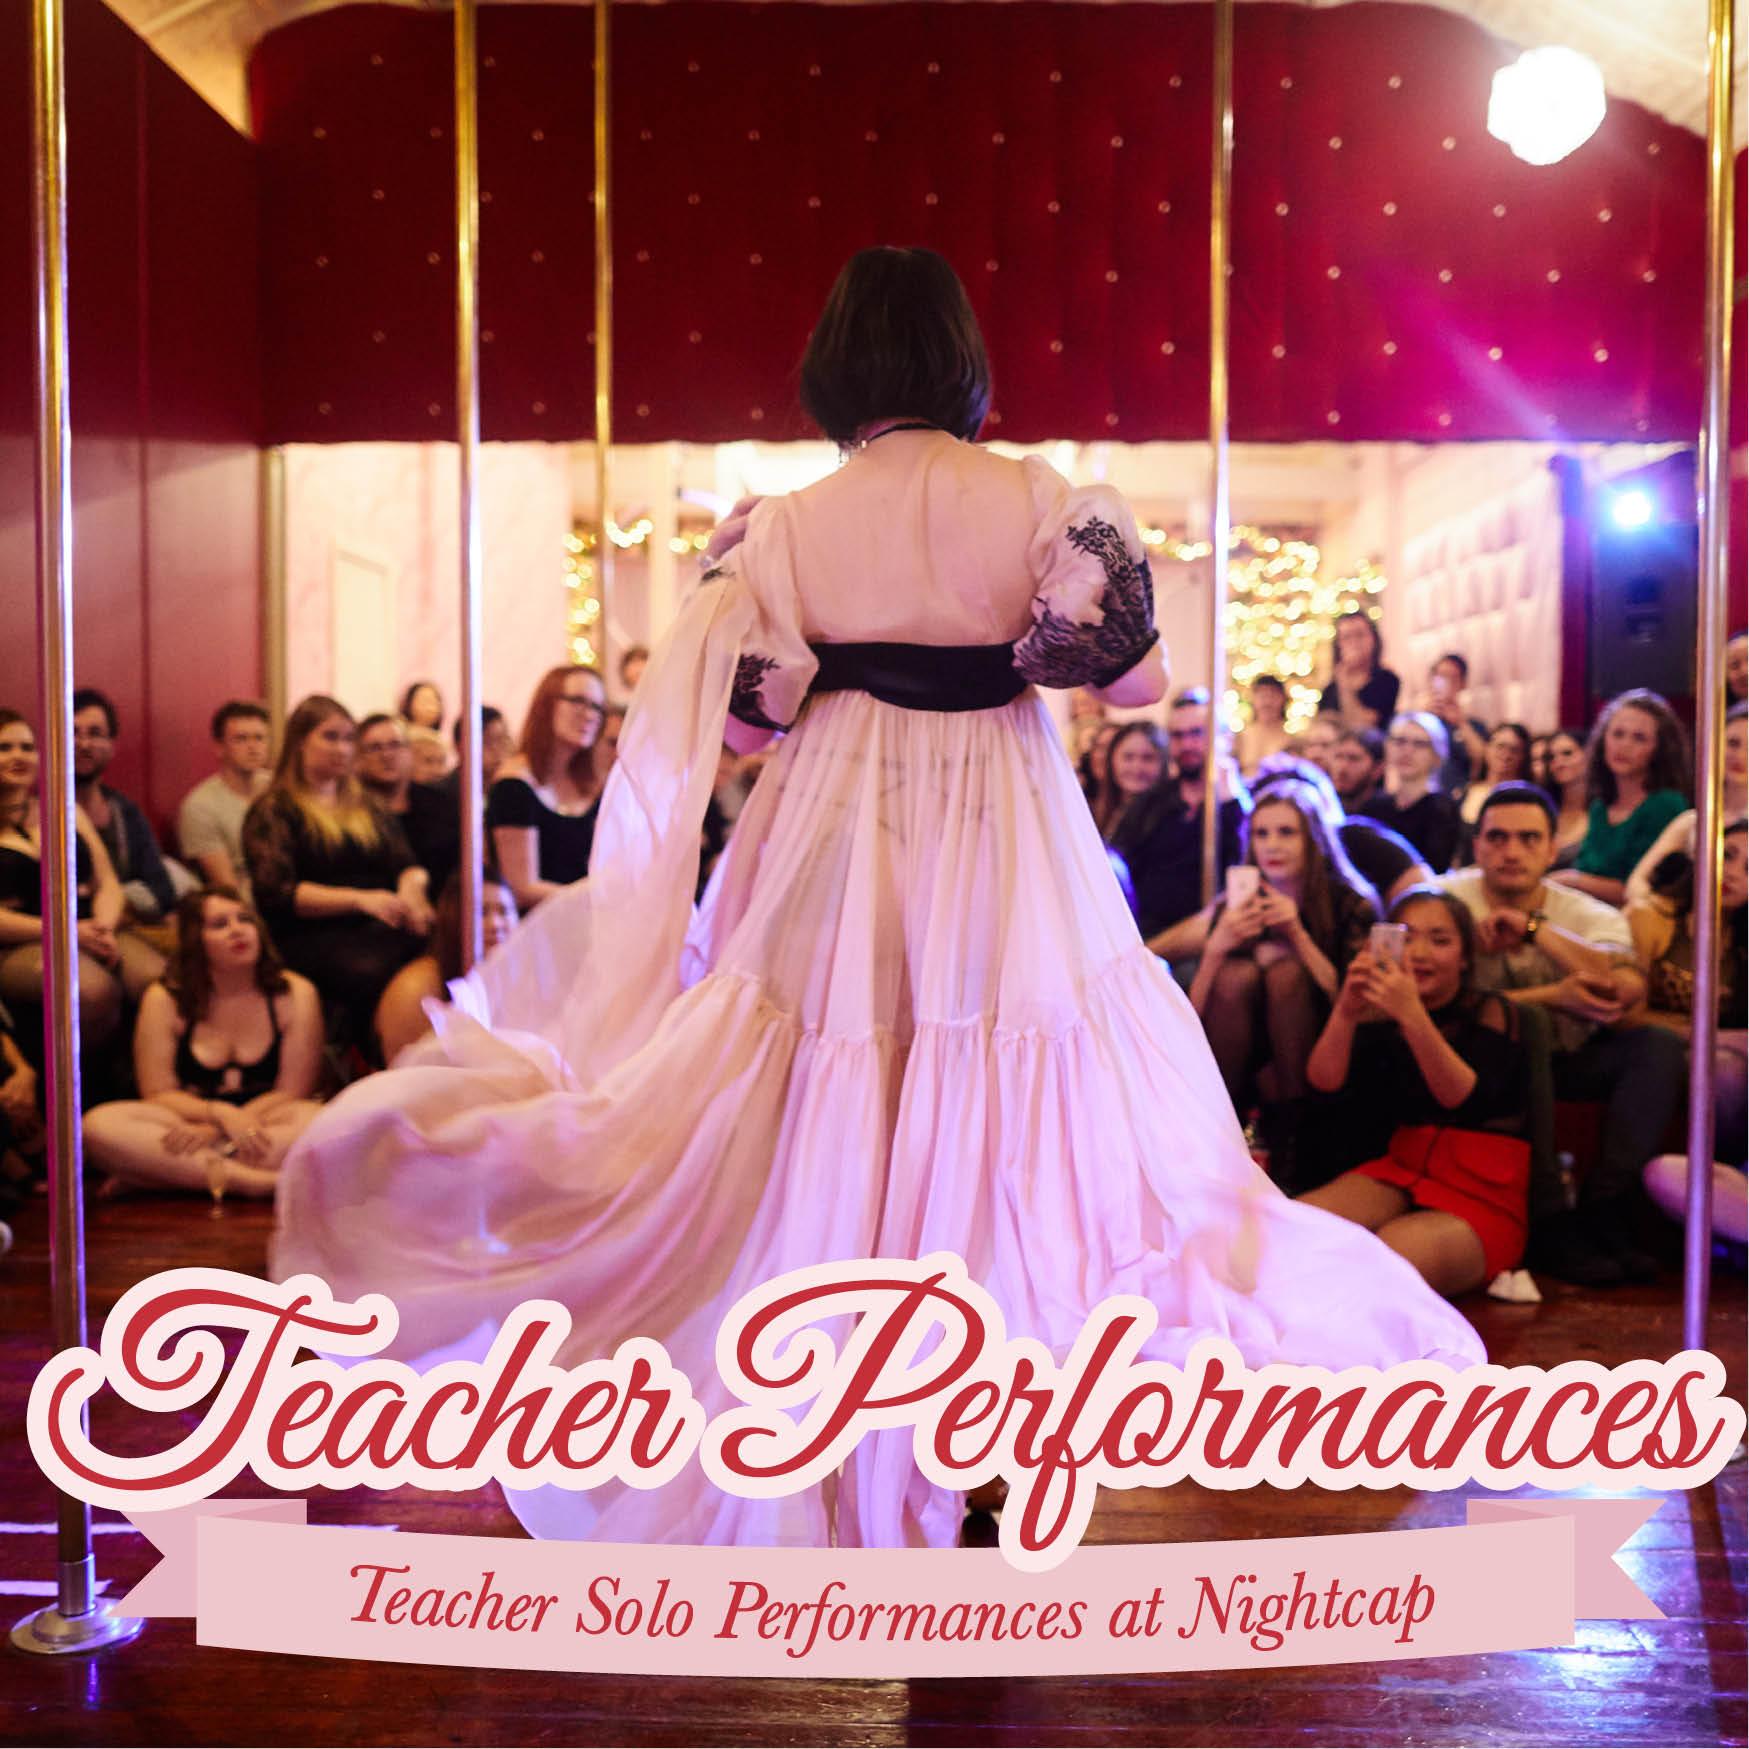 Teacher-Performances.jpg